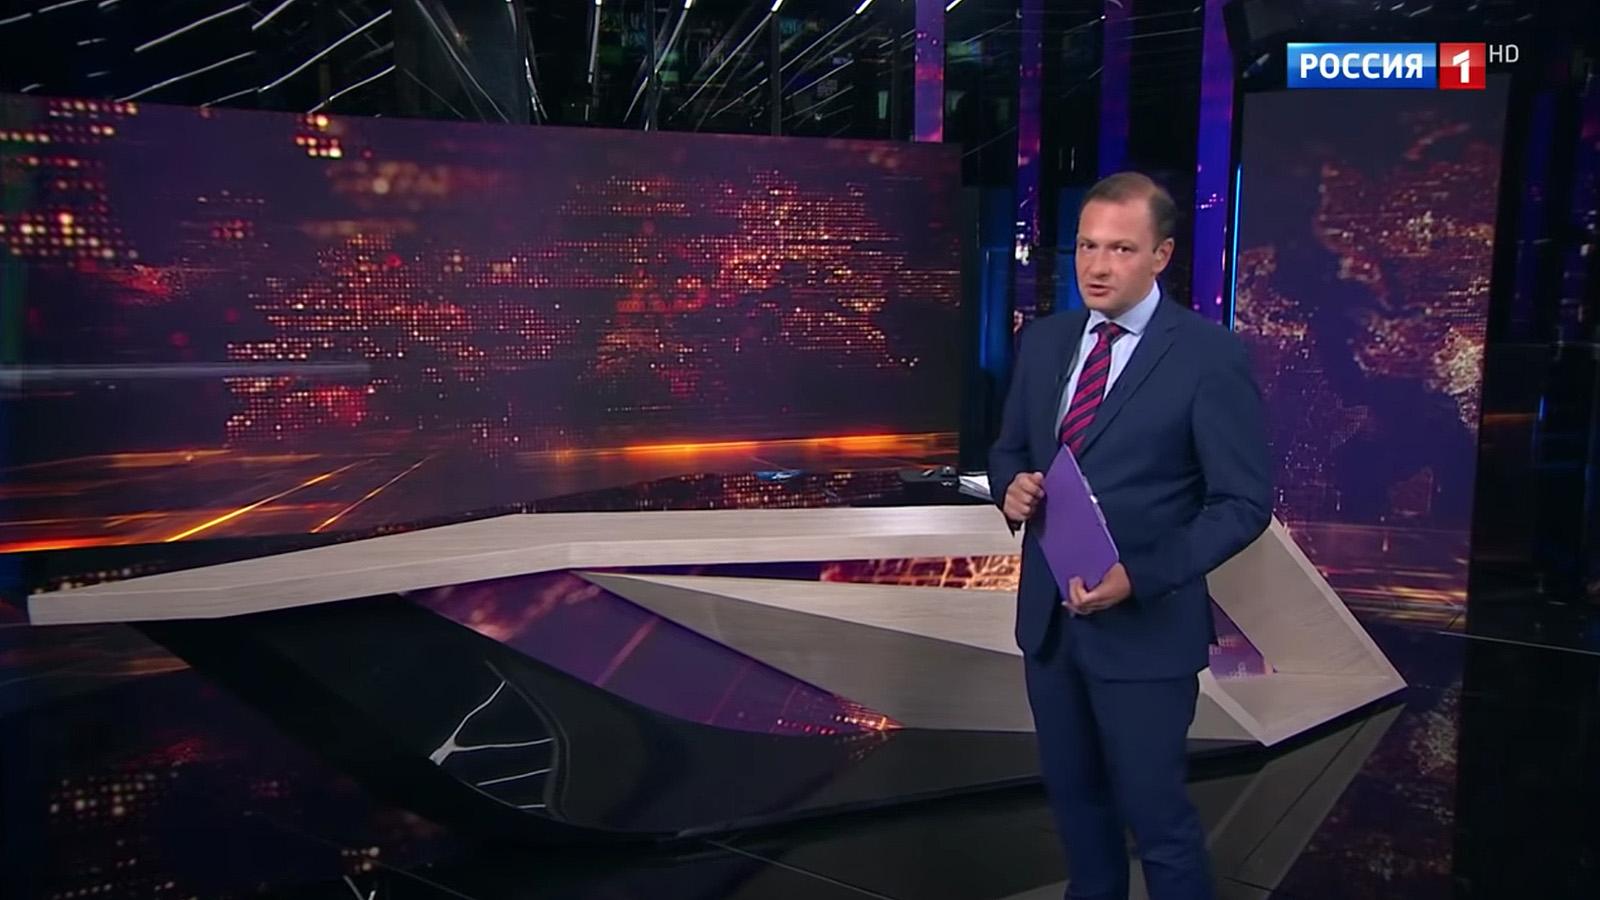 NCS_Russia-1-Vesti-Studio_0014